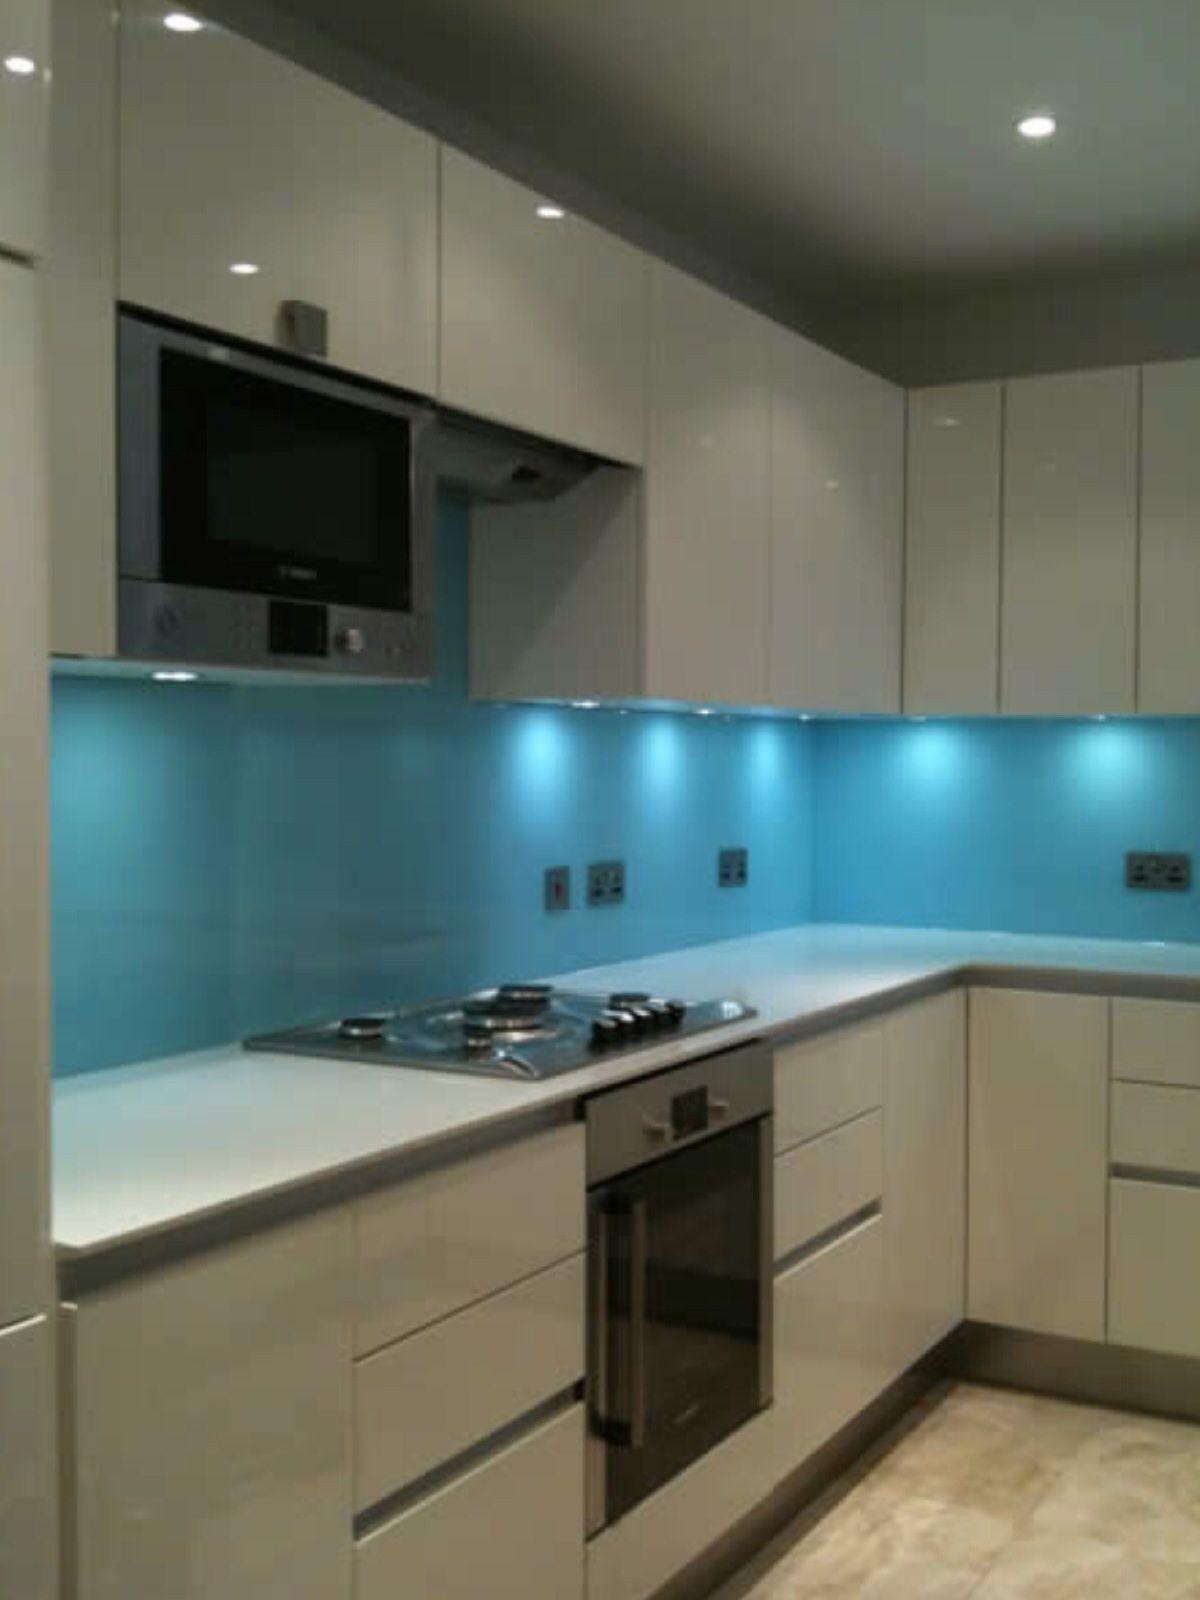 New gloss kitchen with glass splashback | decoração apartamento ...